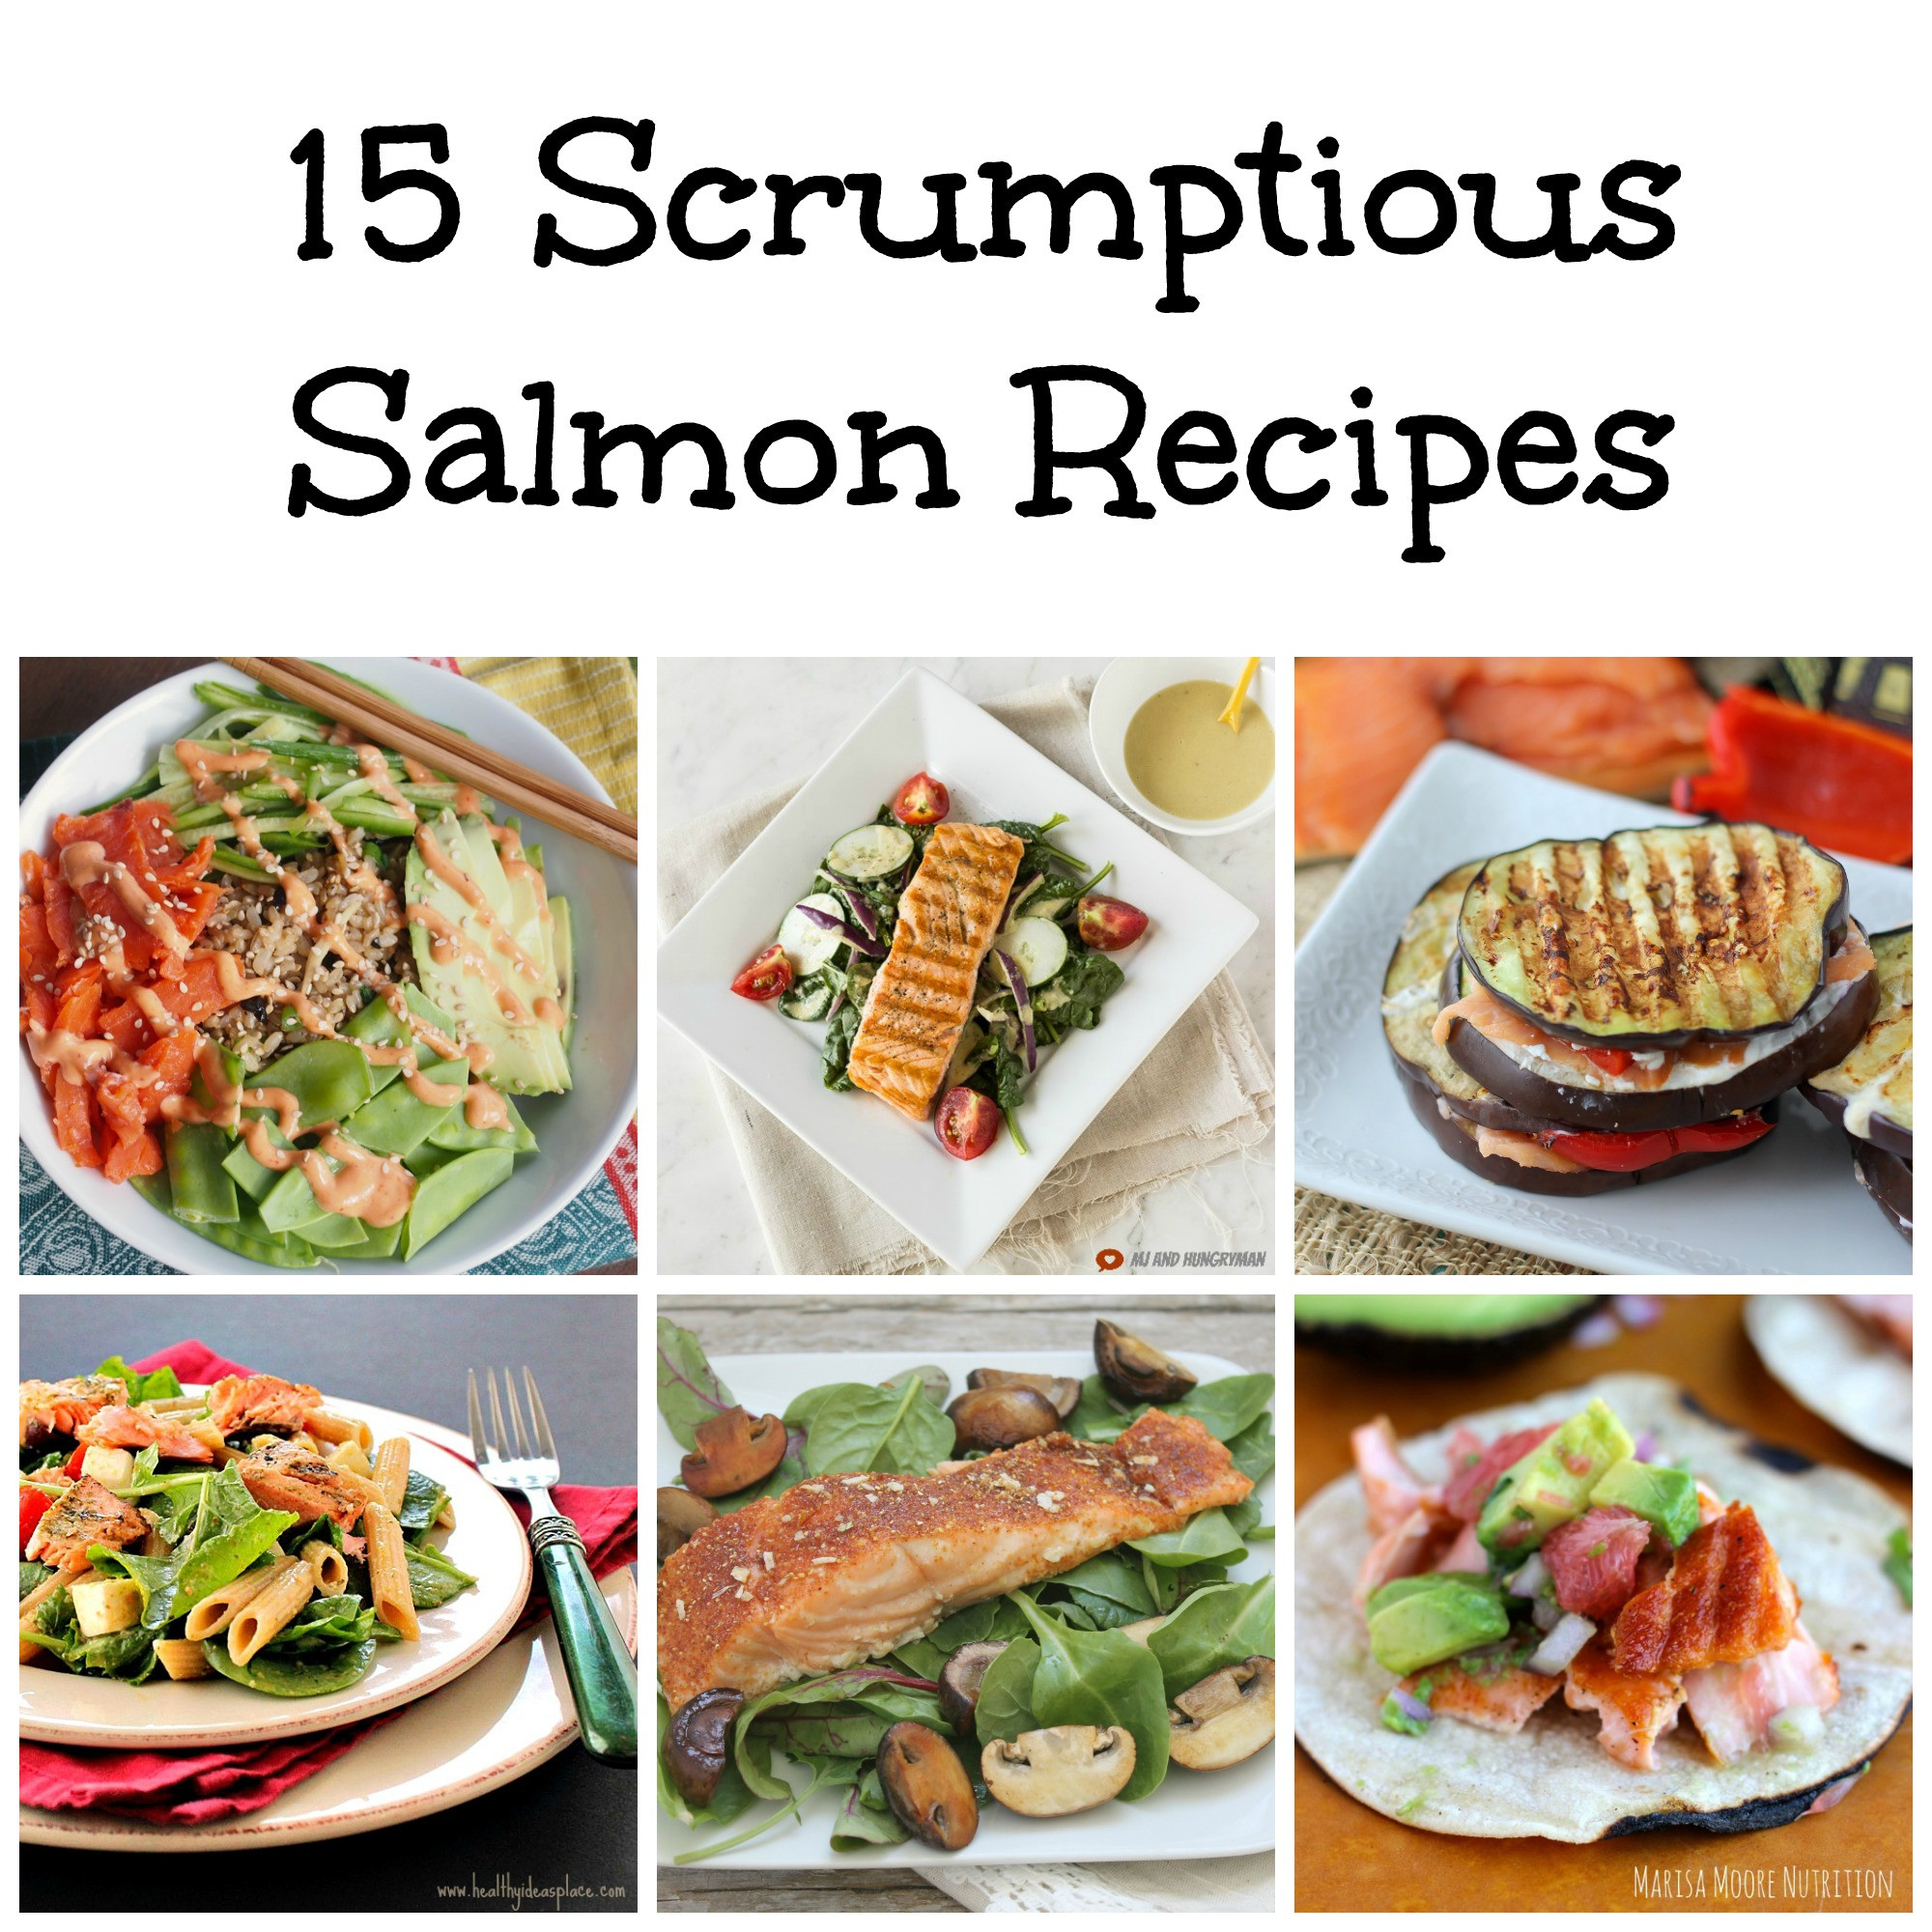 Low Cholesterol Salmon Recipes  15 Scrumptious Salmon Recipes Part 3 Cholesterol and